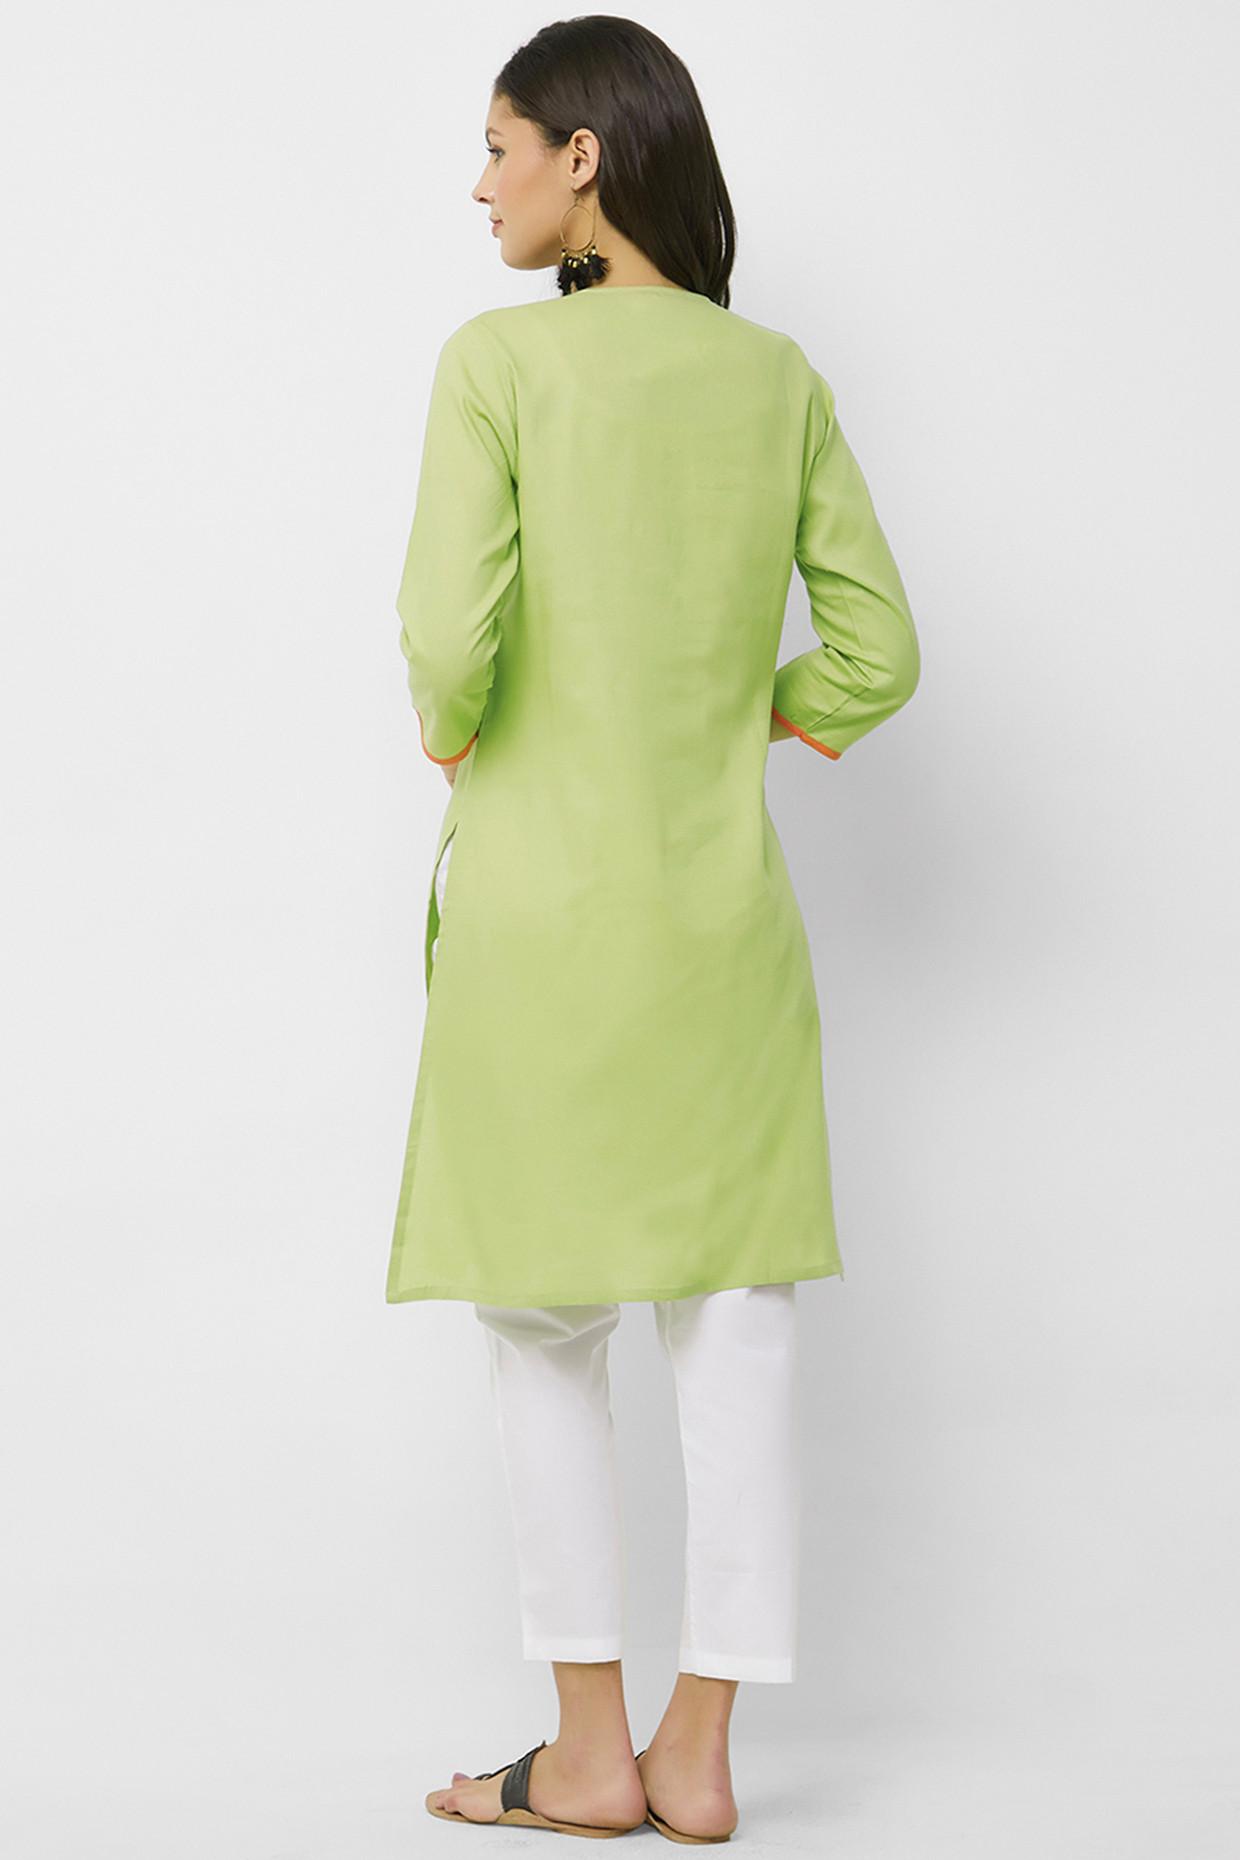 Earthy Olive Toned Kurti In Handloom Cotton by House Of Idar